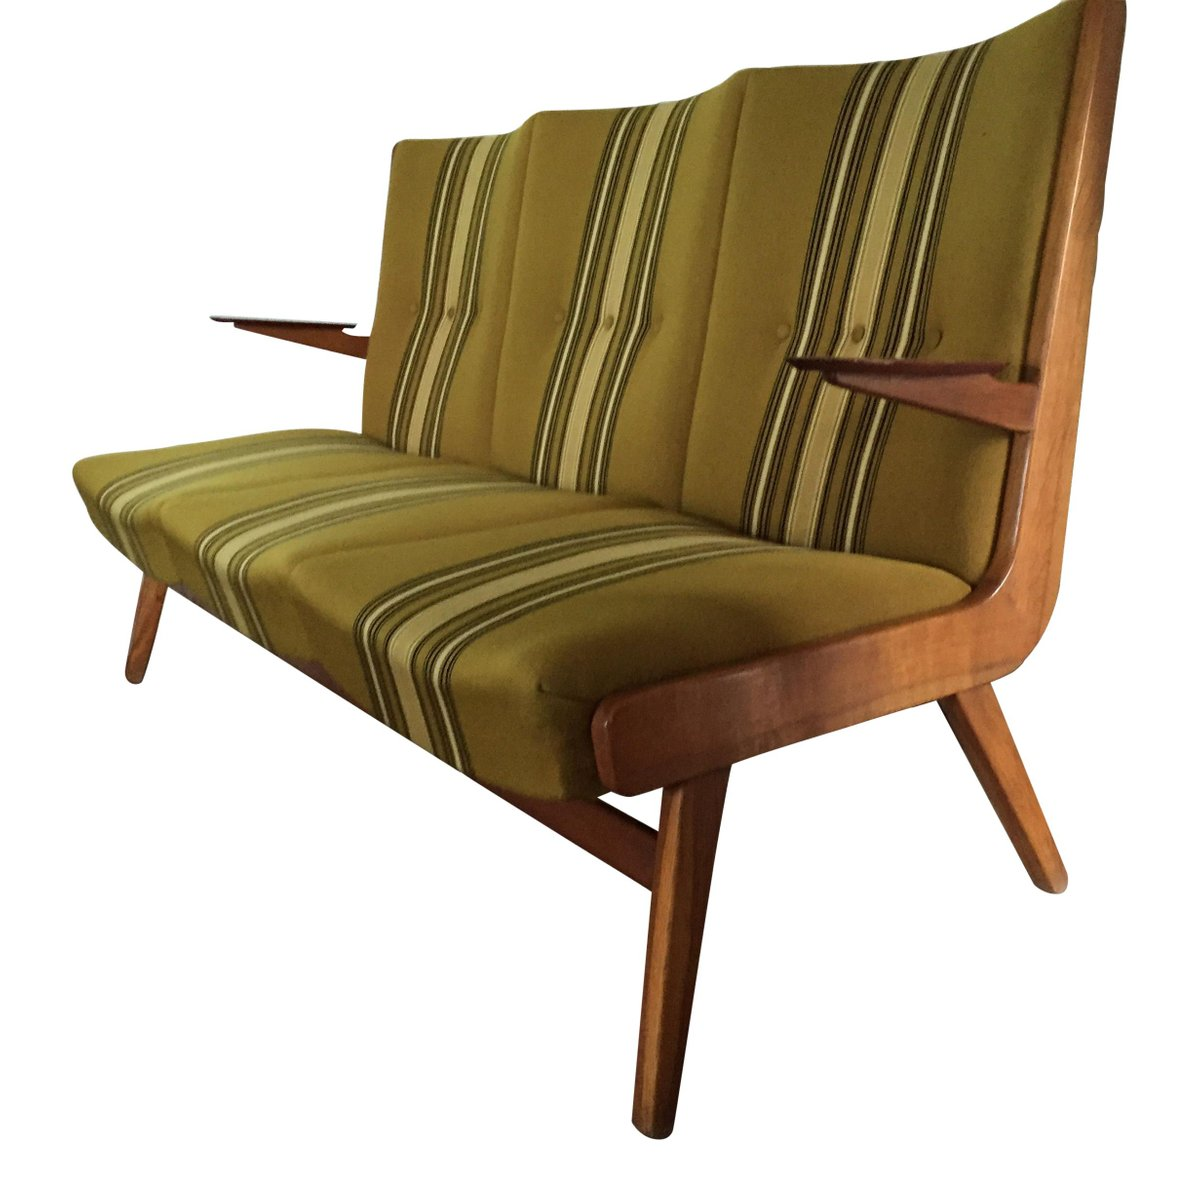 Scandinavian teak sofa 1960s for sale at pamono for Scandinavian sofa